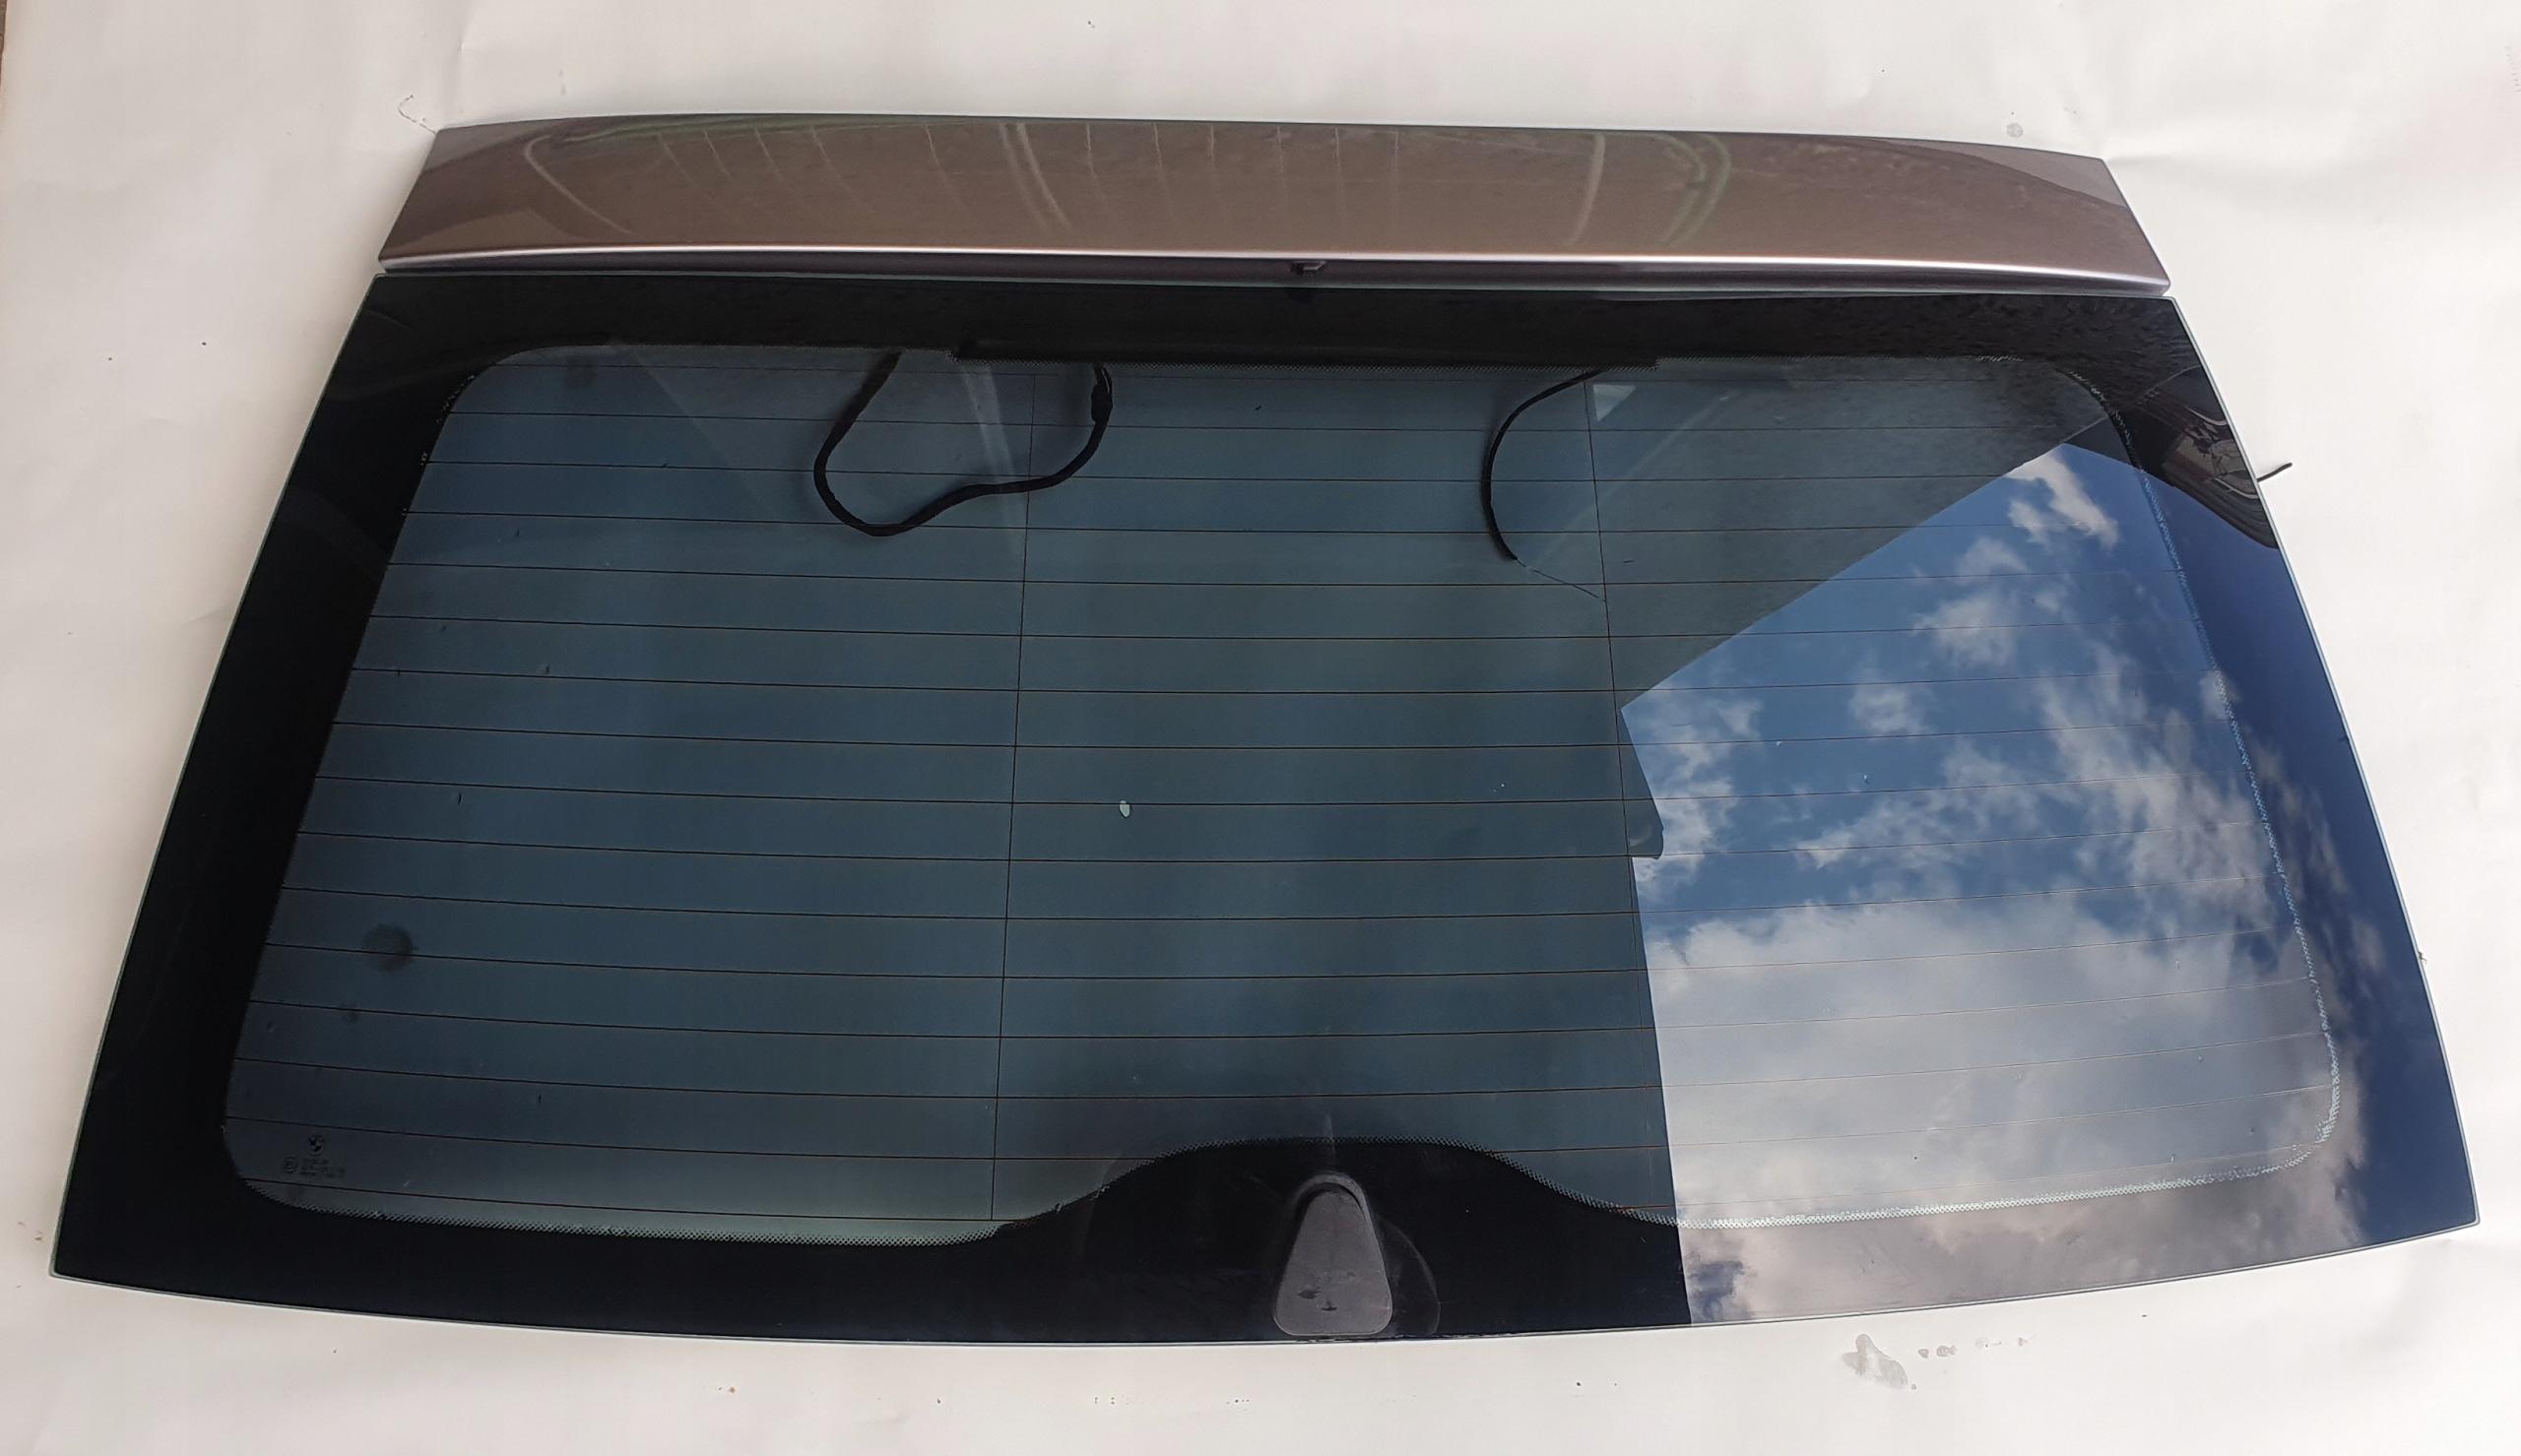 bmw e39 универсал touring стекло рамка люка багажник